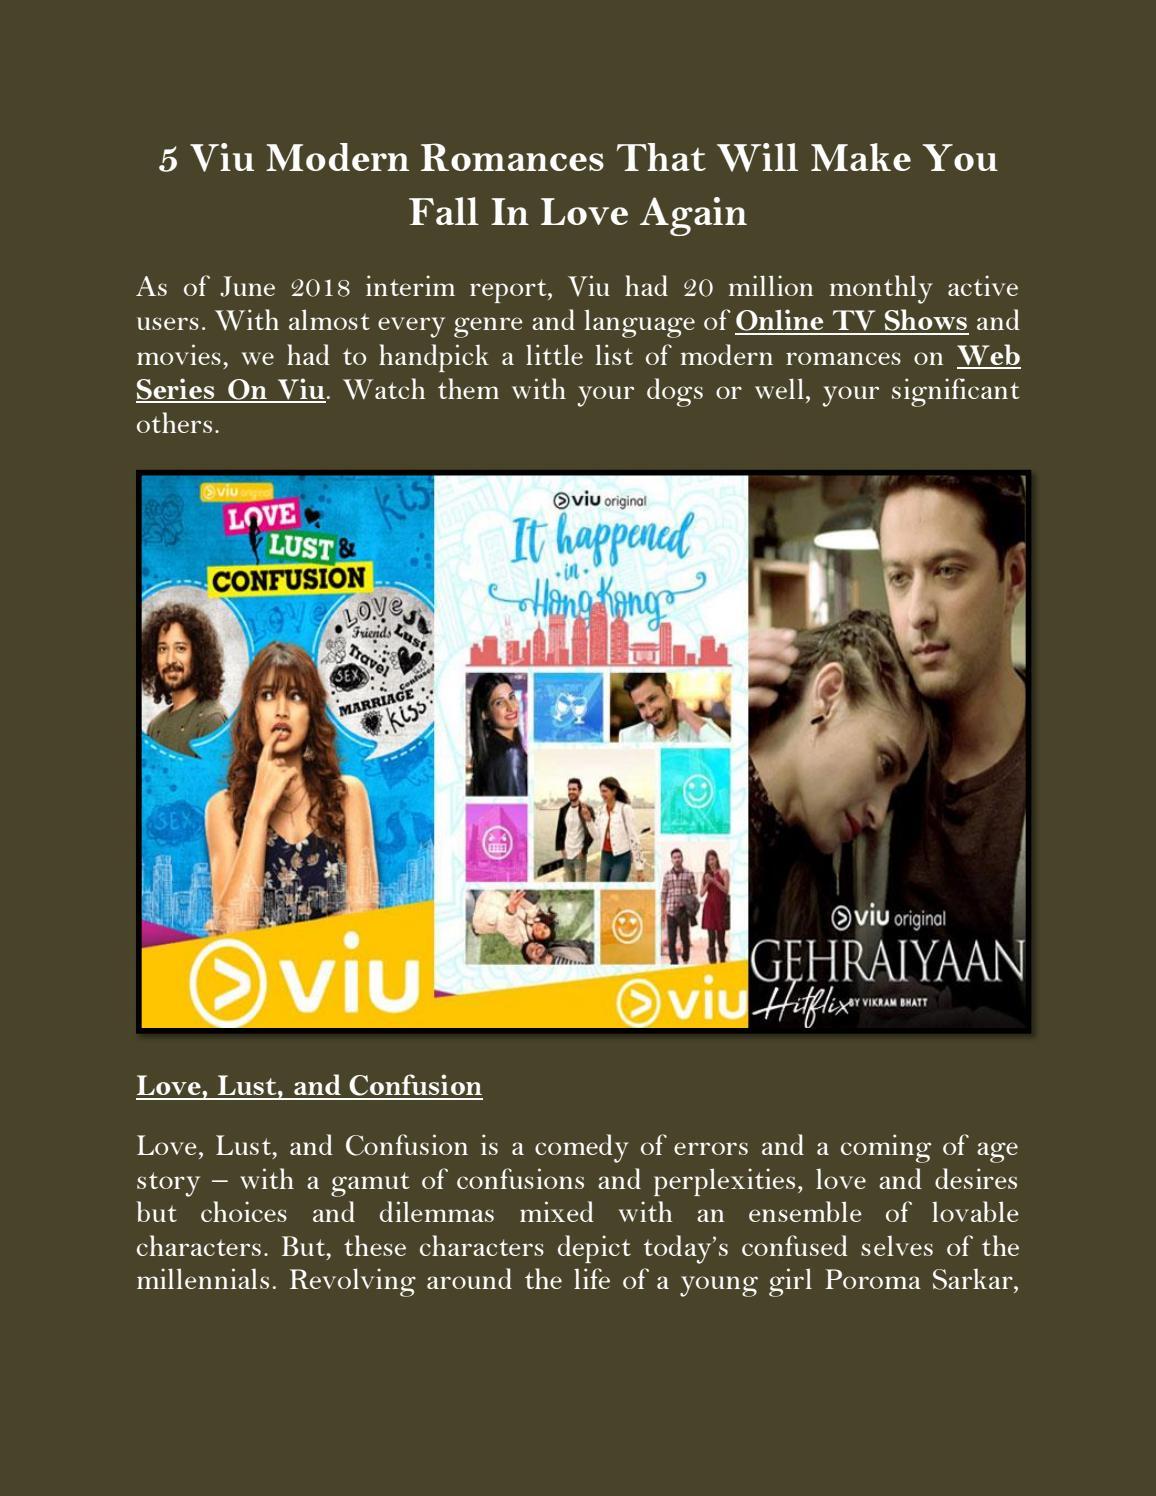 5 Viu Modern Romances That Will Make You Fall In Love Again